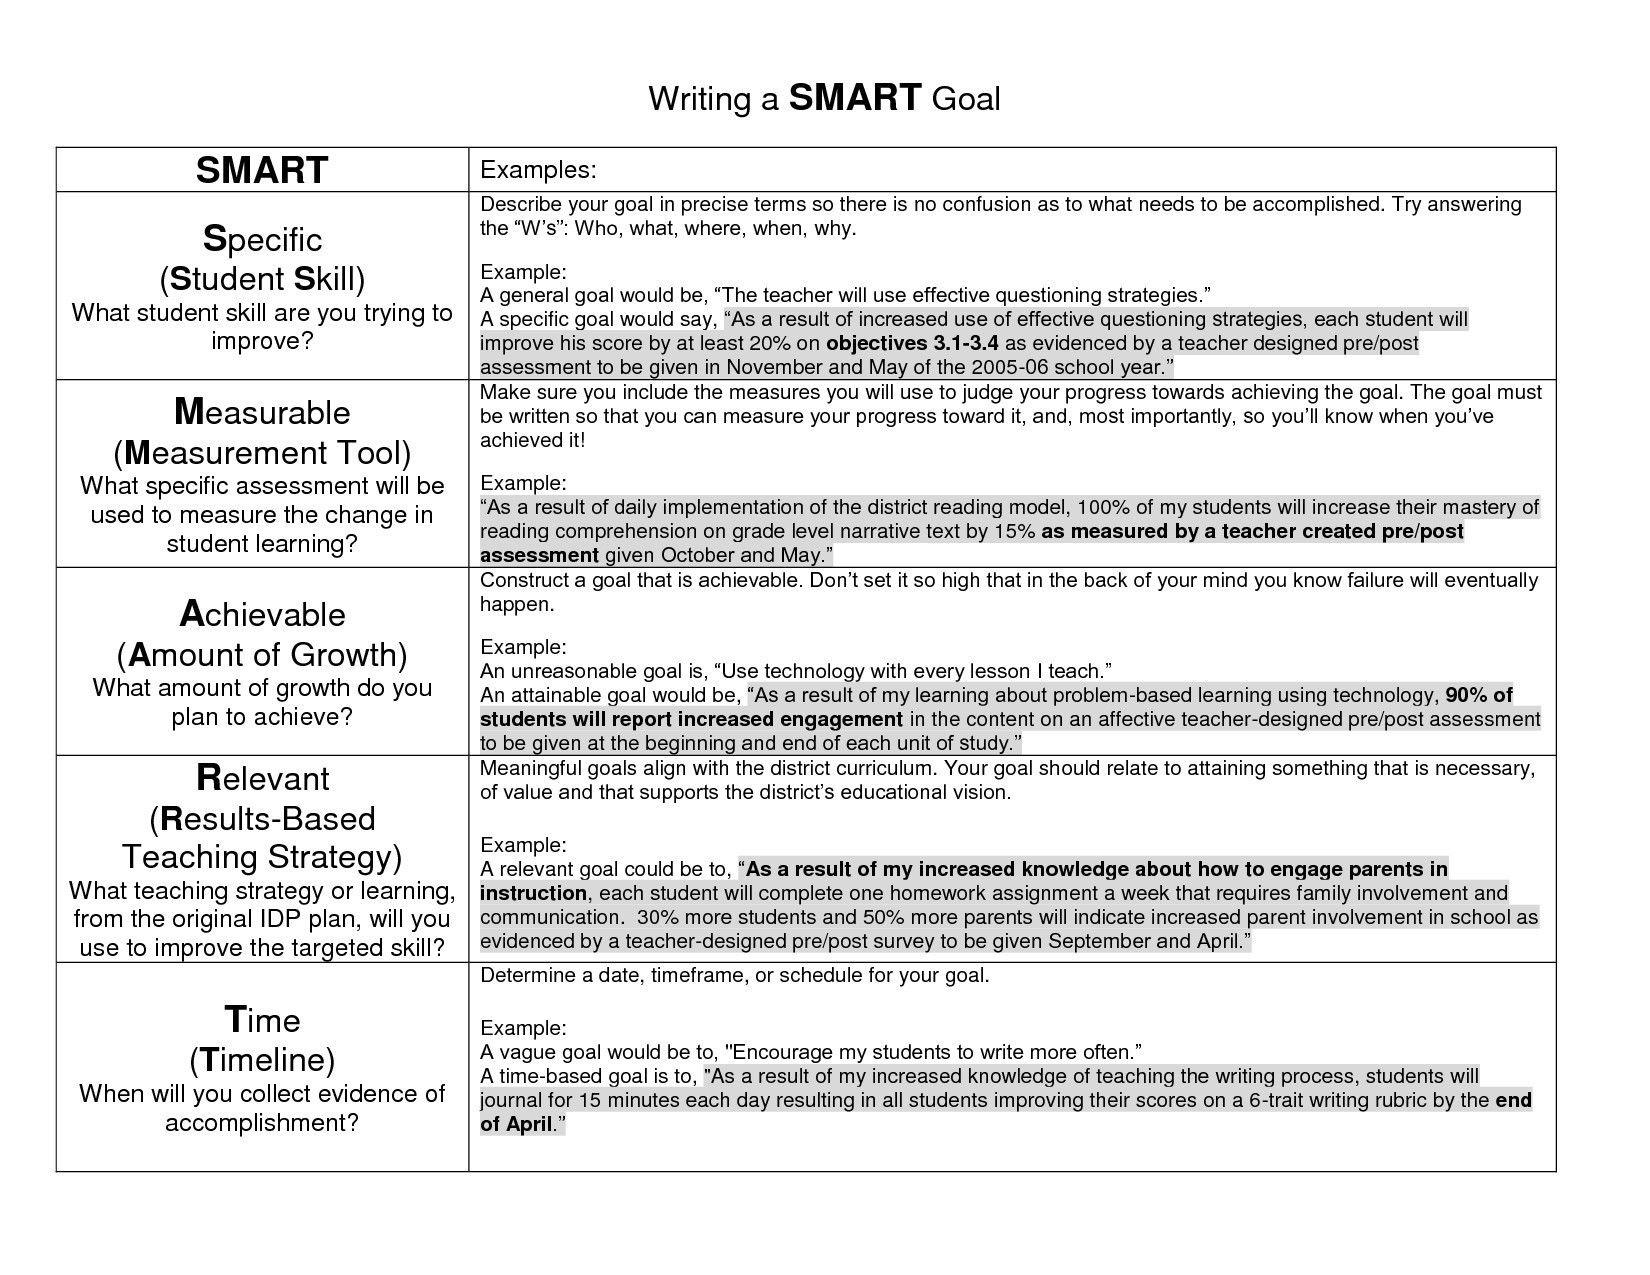 Evidence Worksheet